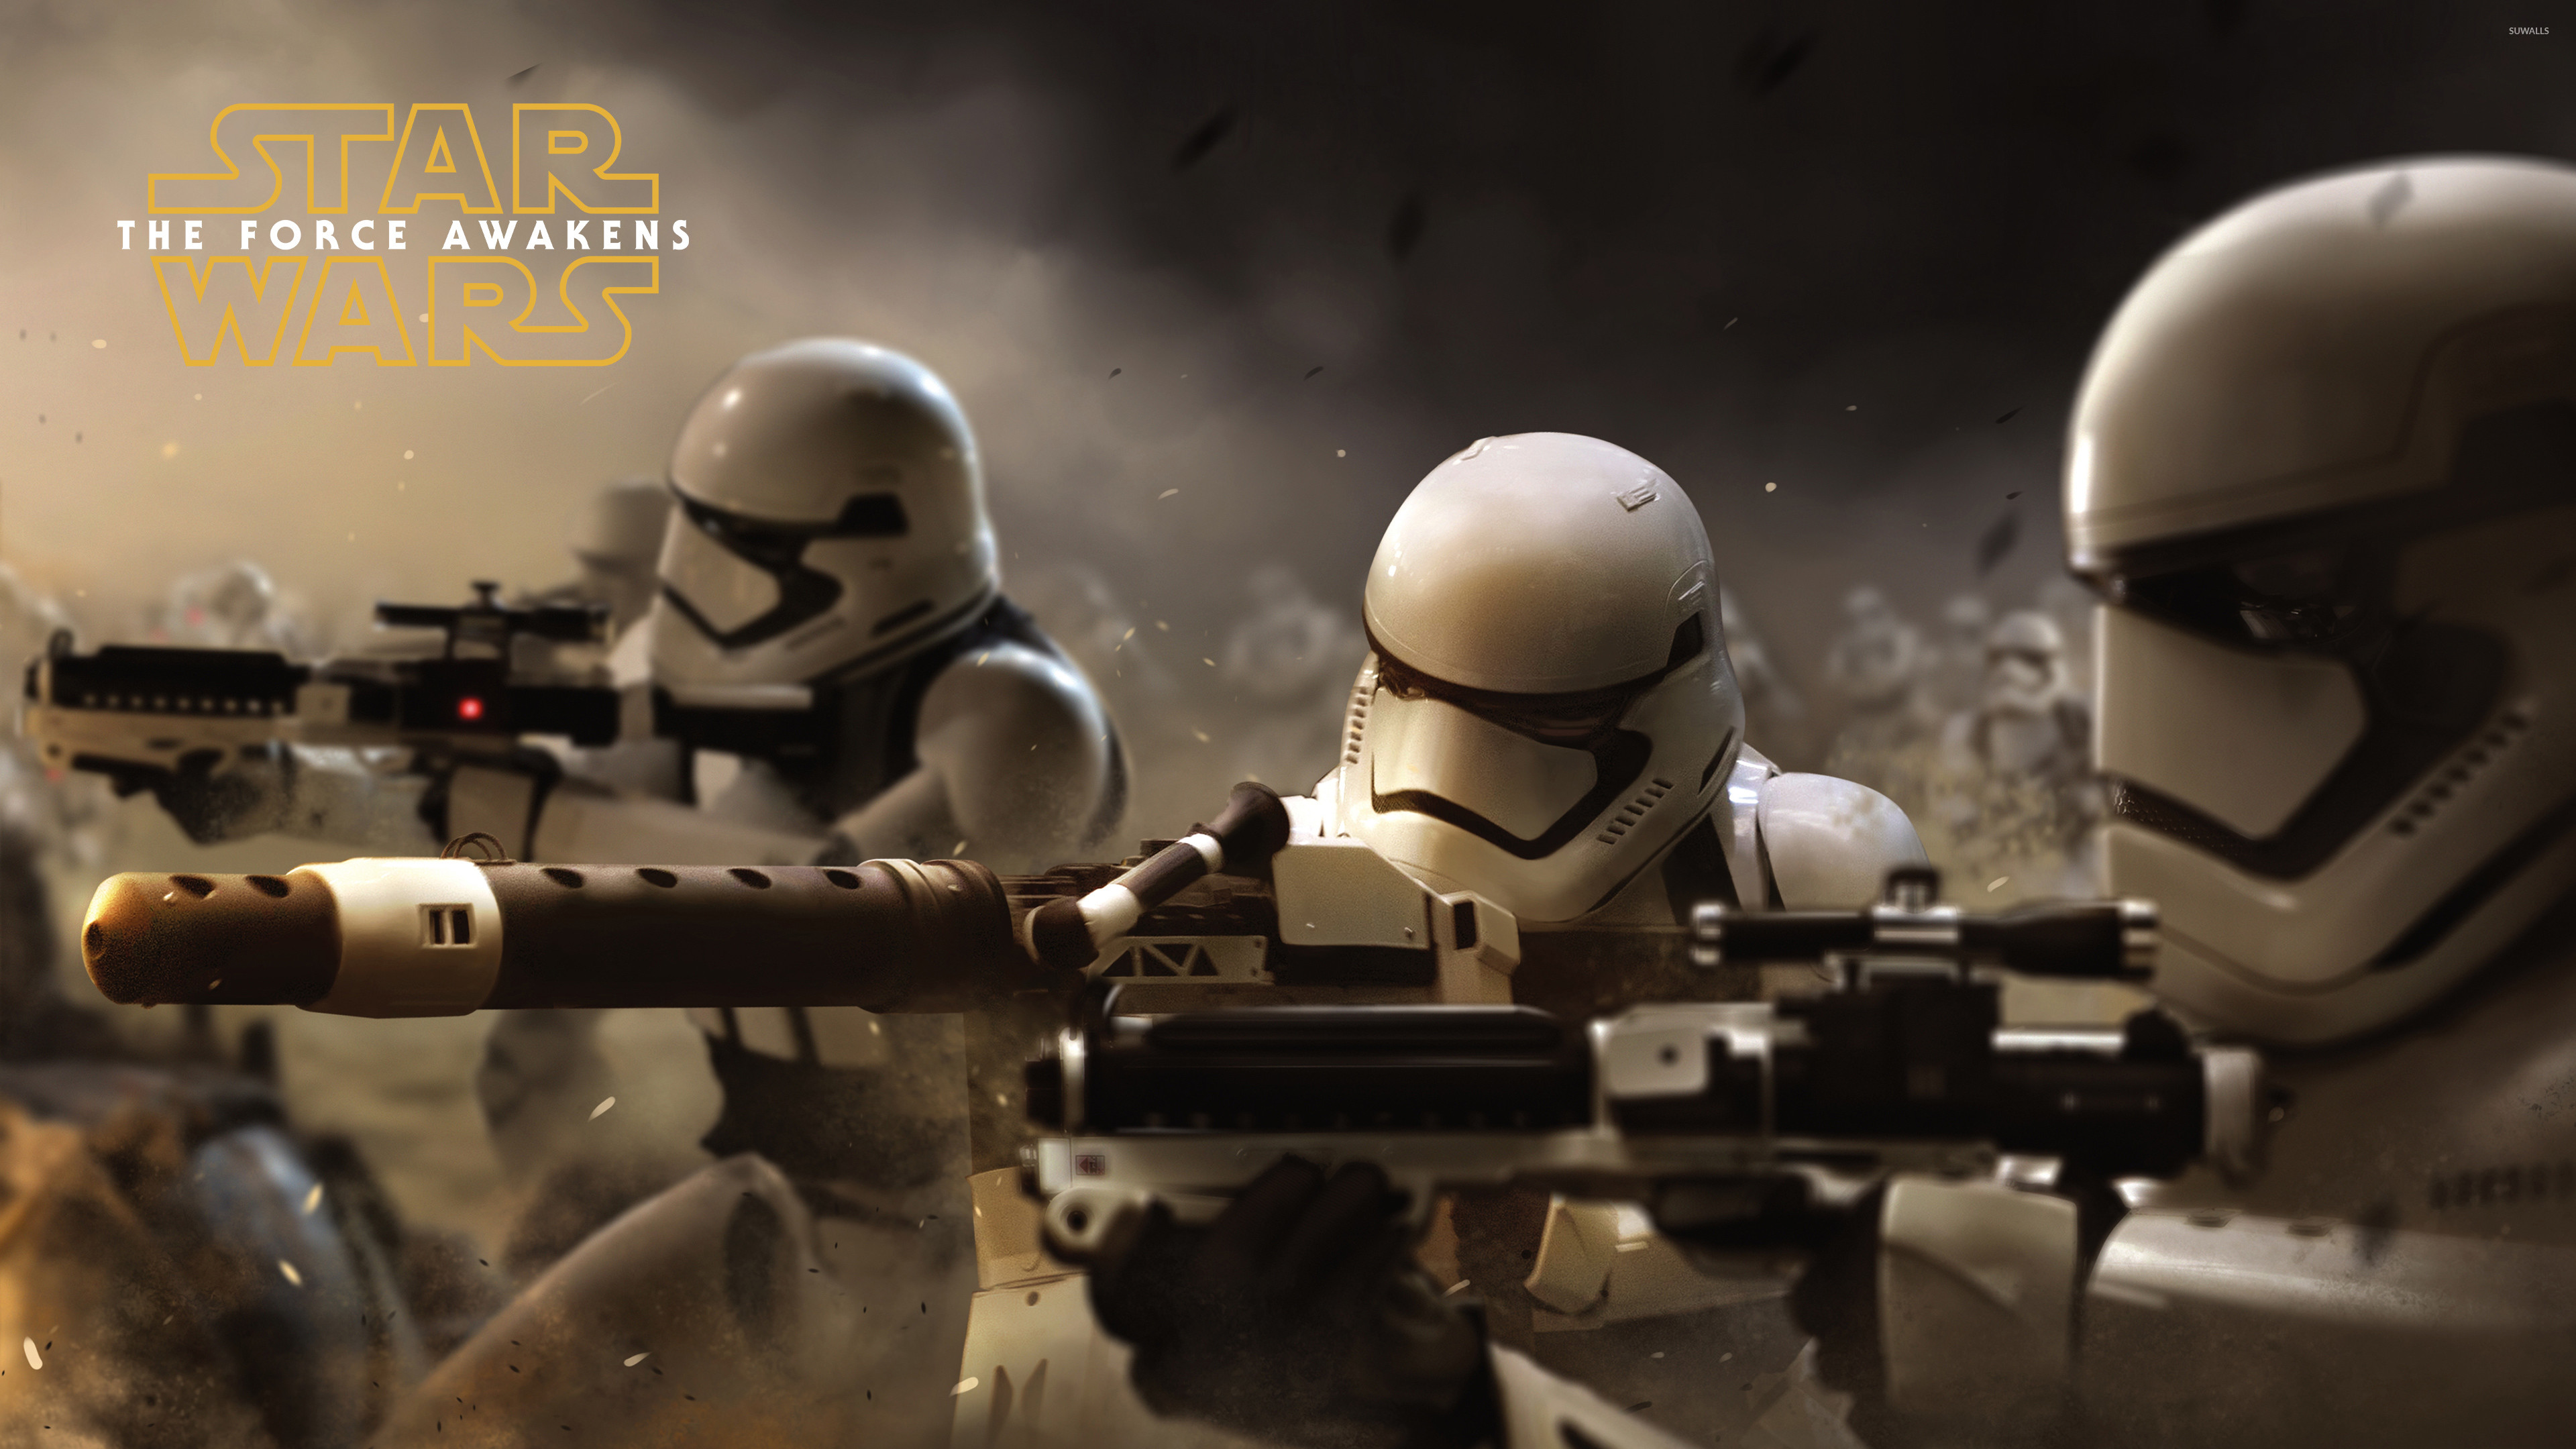 Stormtroopers in Star Wars: The Force Awakens wallpaper jpg